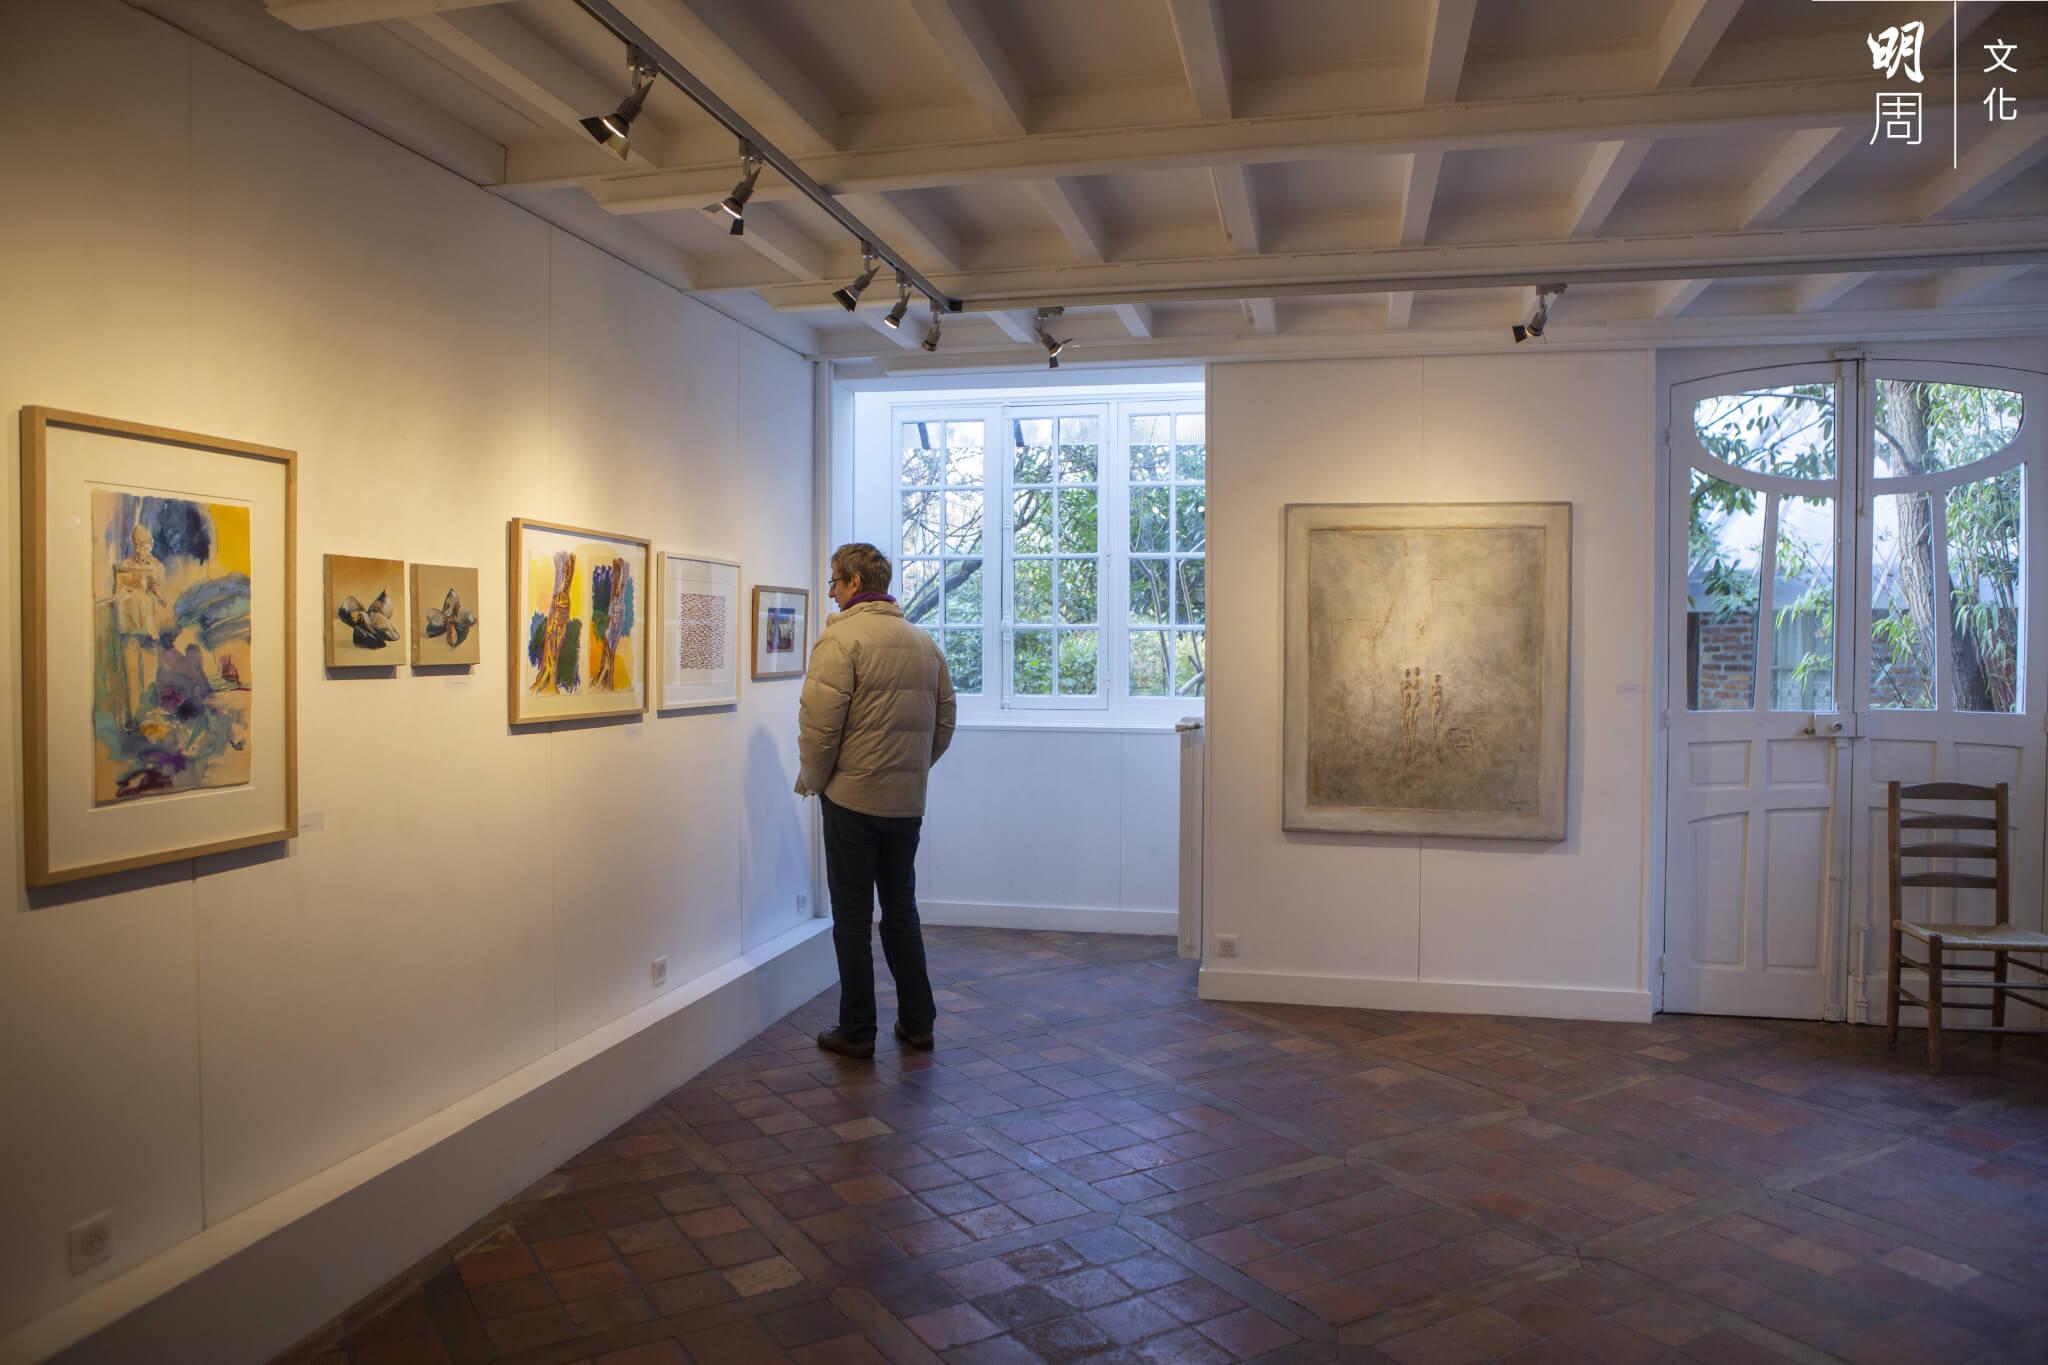 La Ruche現設有開放公眾參觀的展覽空間